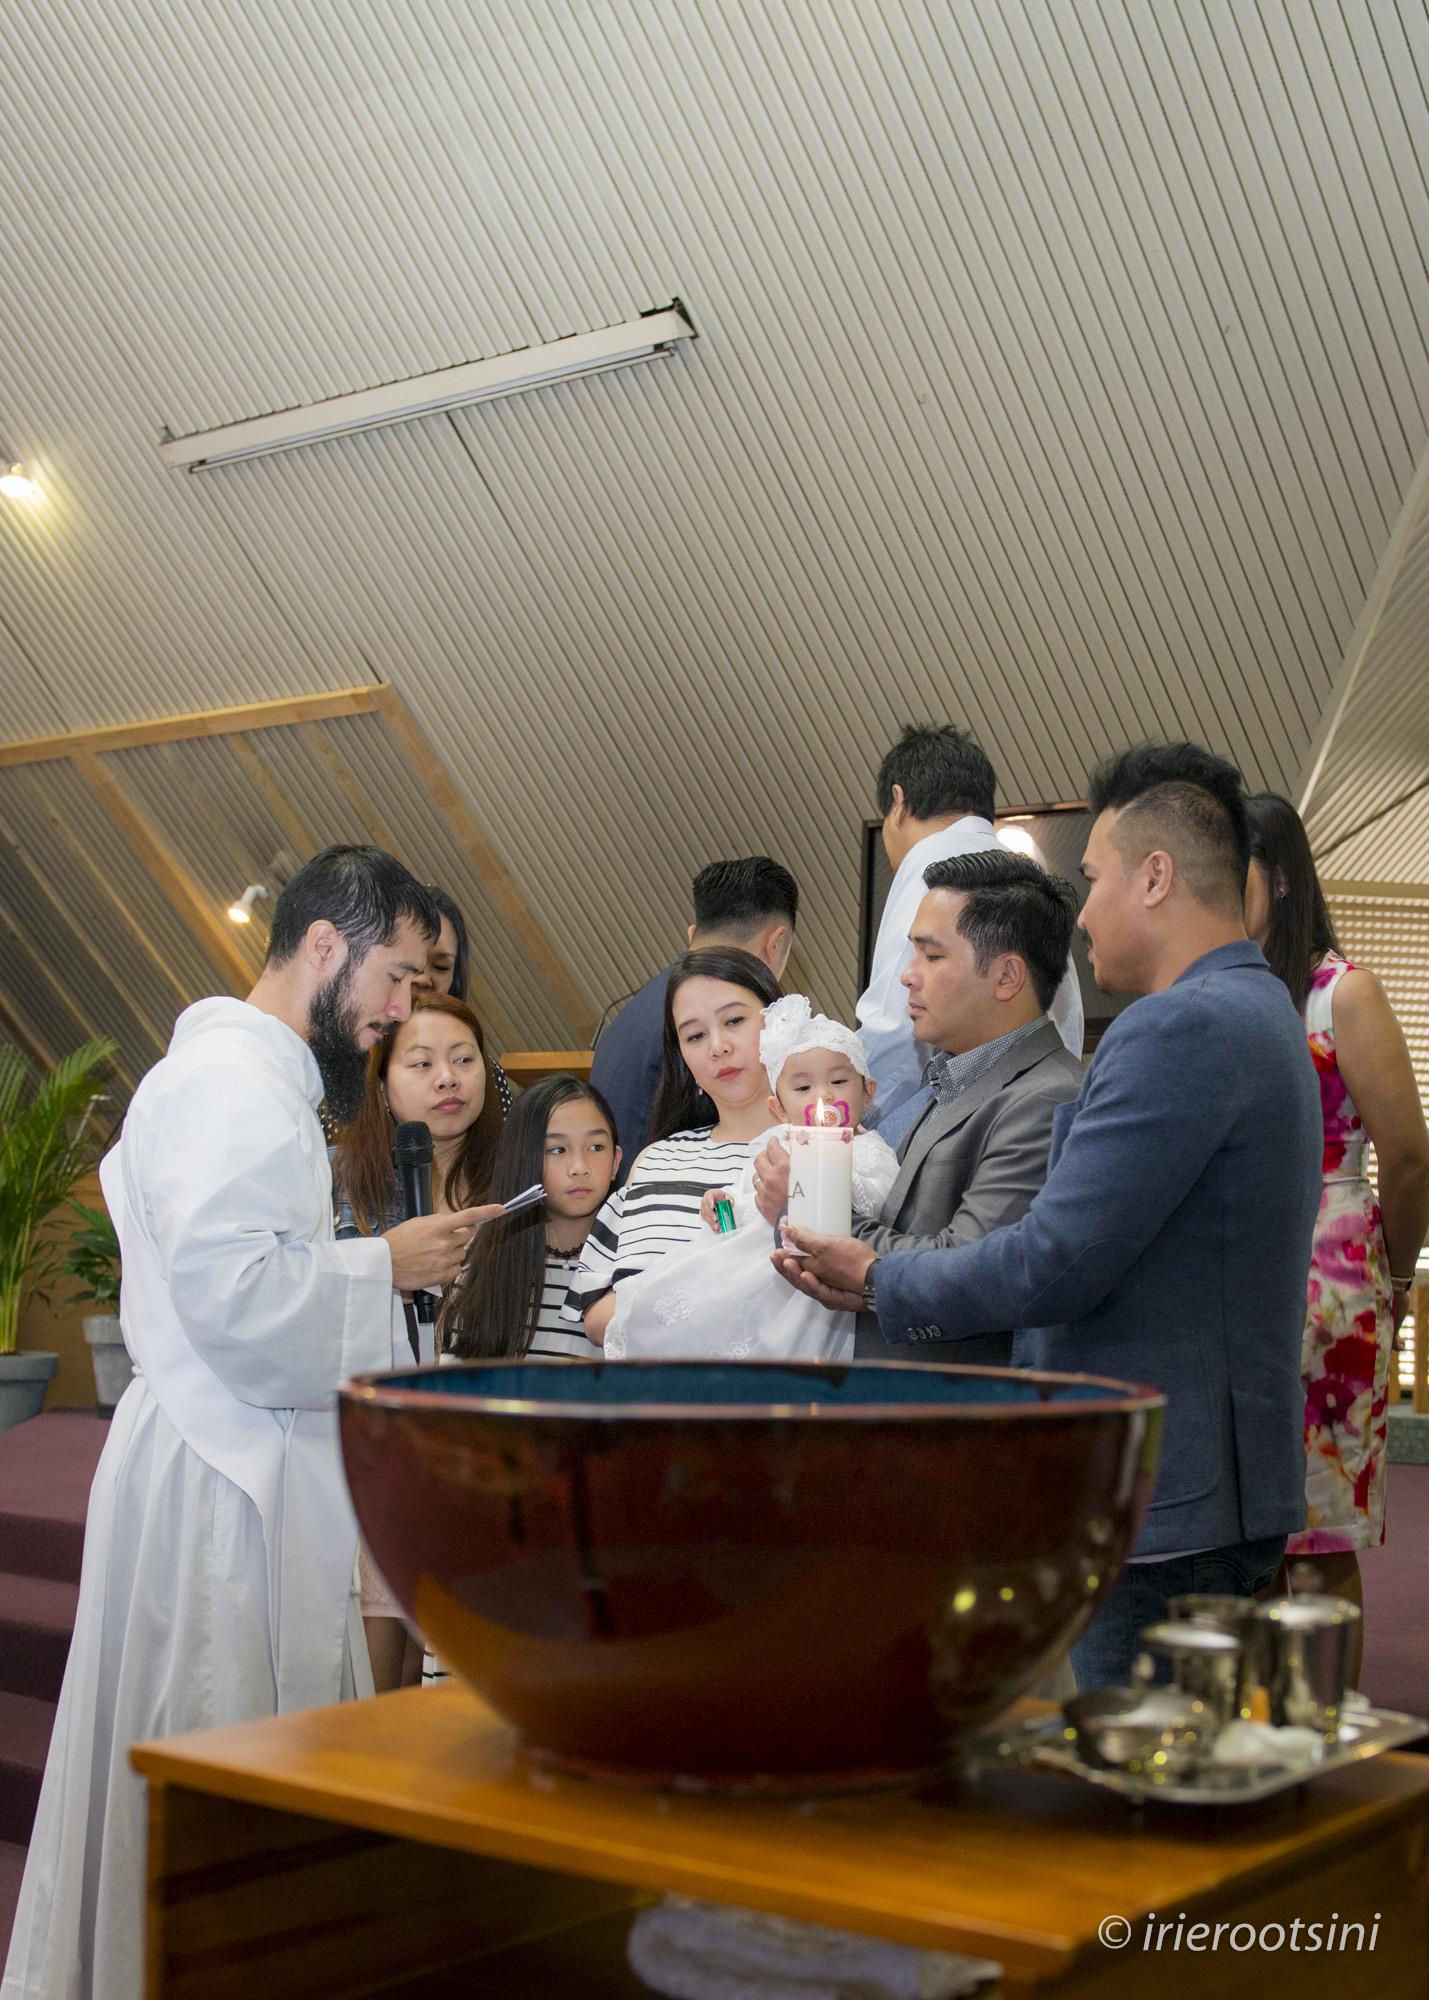 The Good Shepherd Parish Plumpton Christening